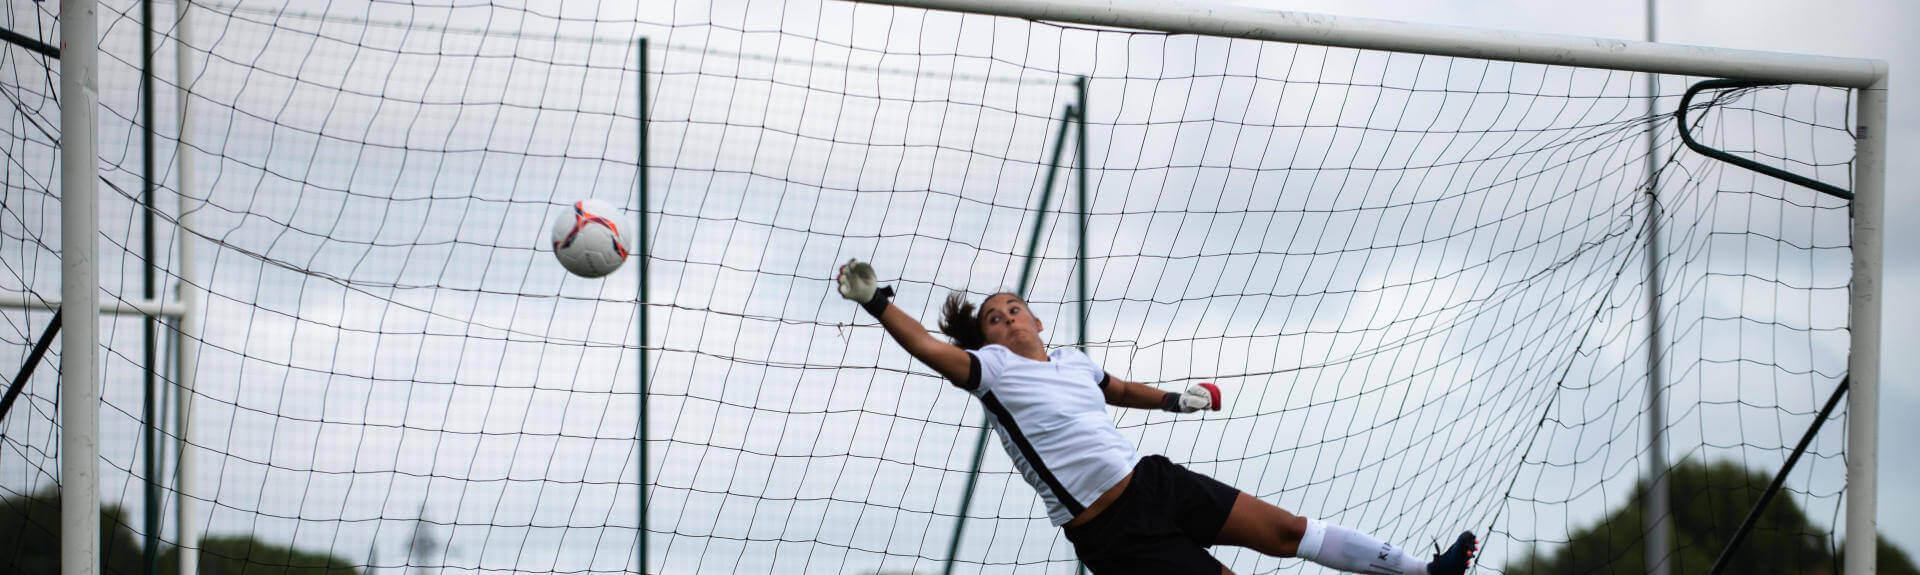 Women's Football - Vijaya K - All for the love of the gam